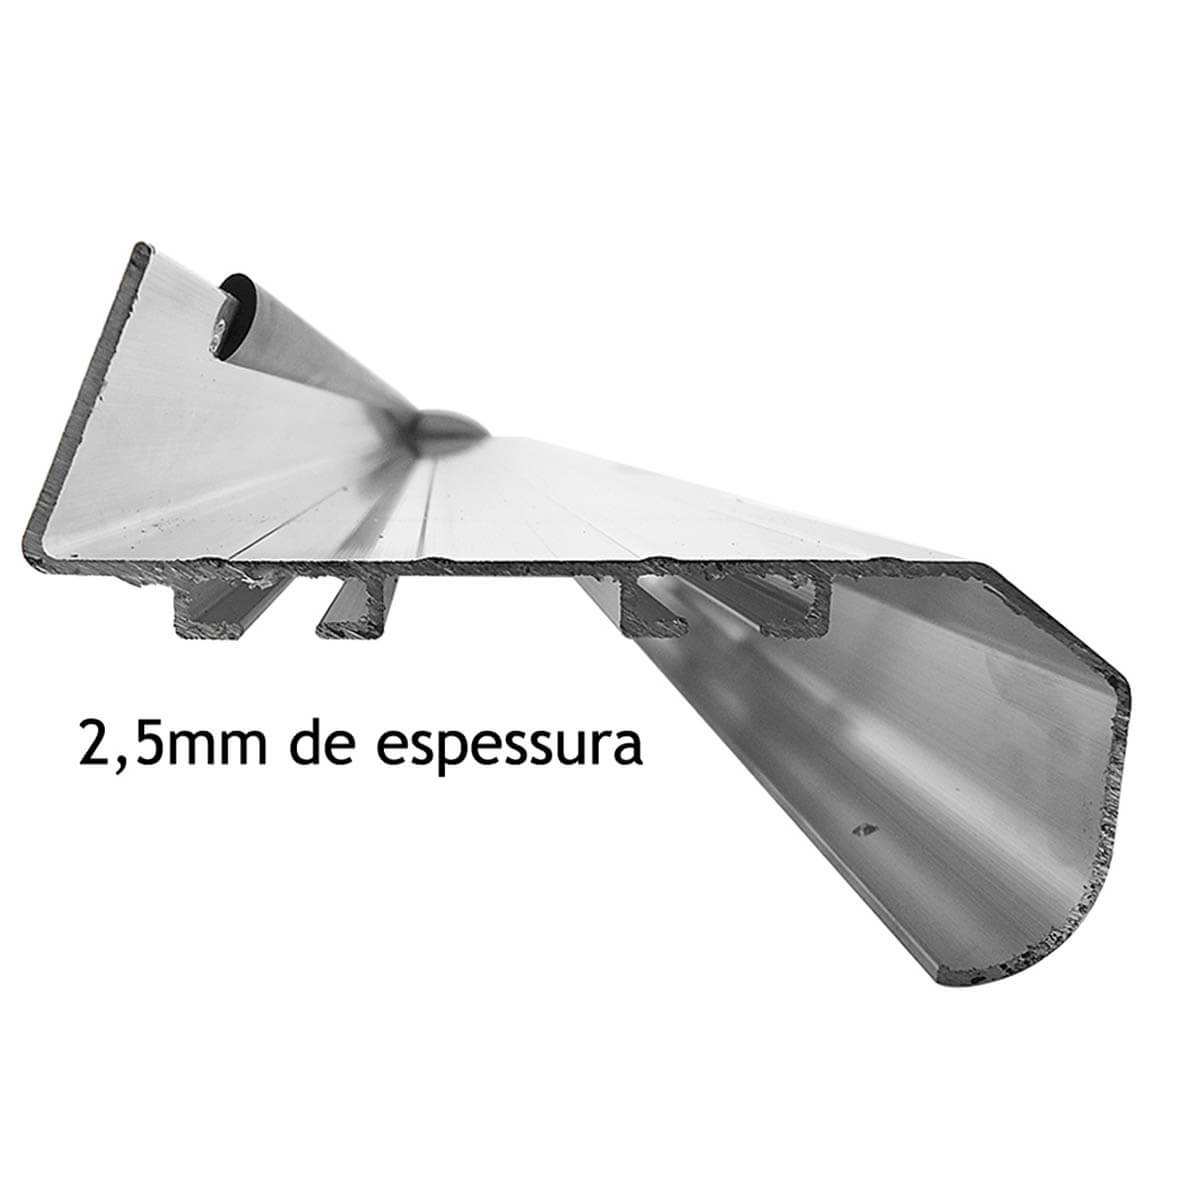 Estribo plataforma alumínio preto Novo Ecosport 2013 a 2017